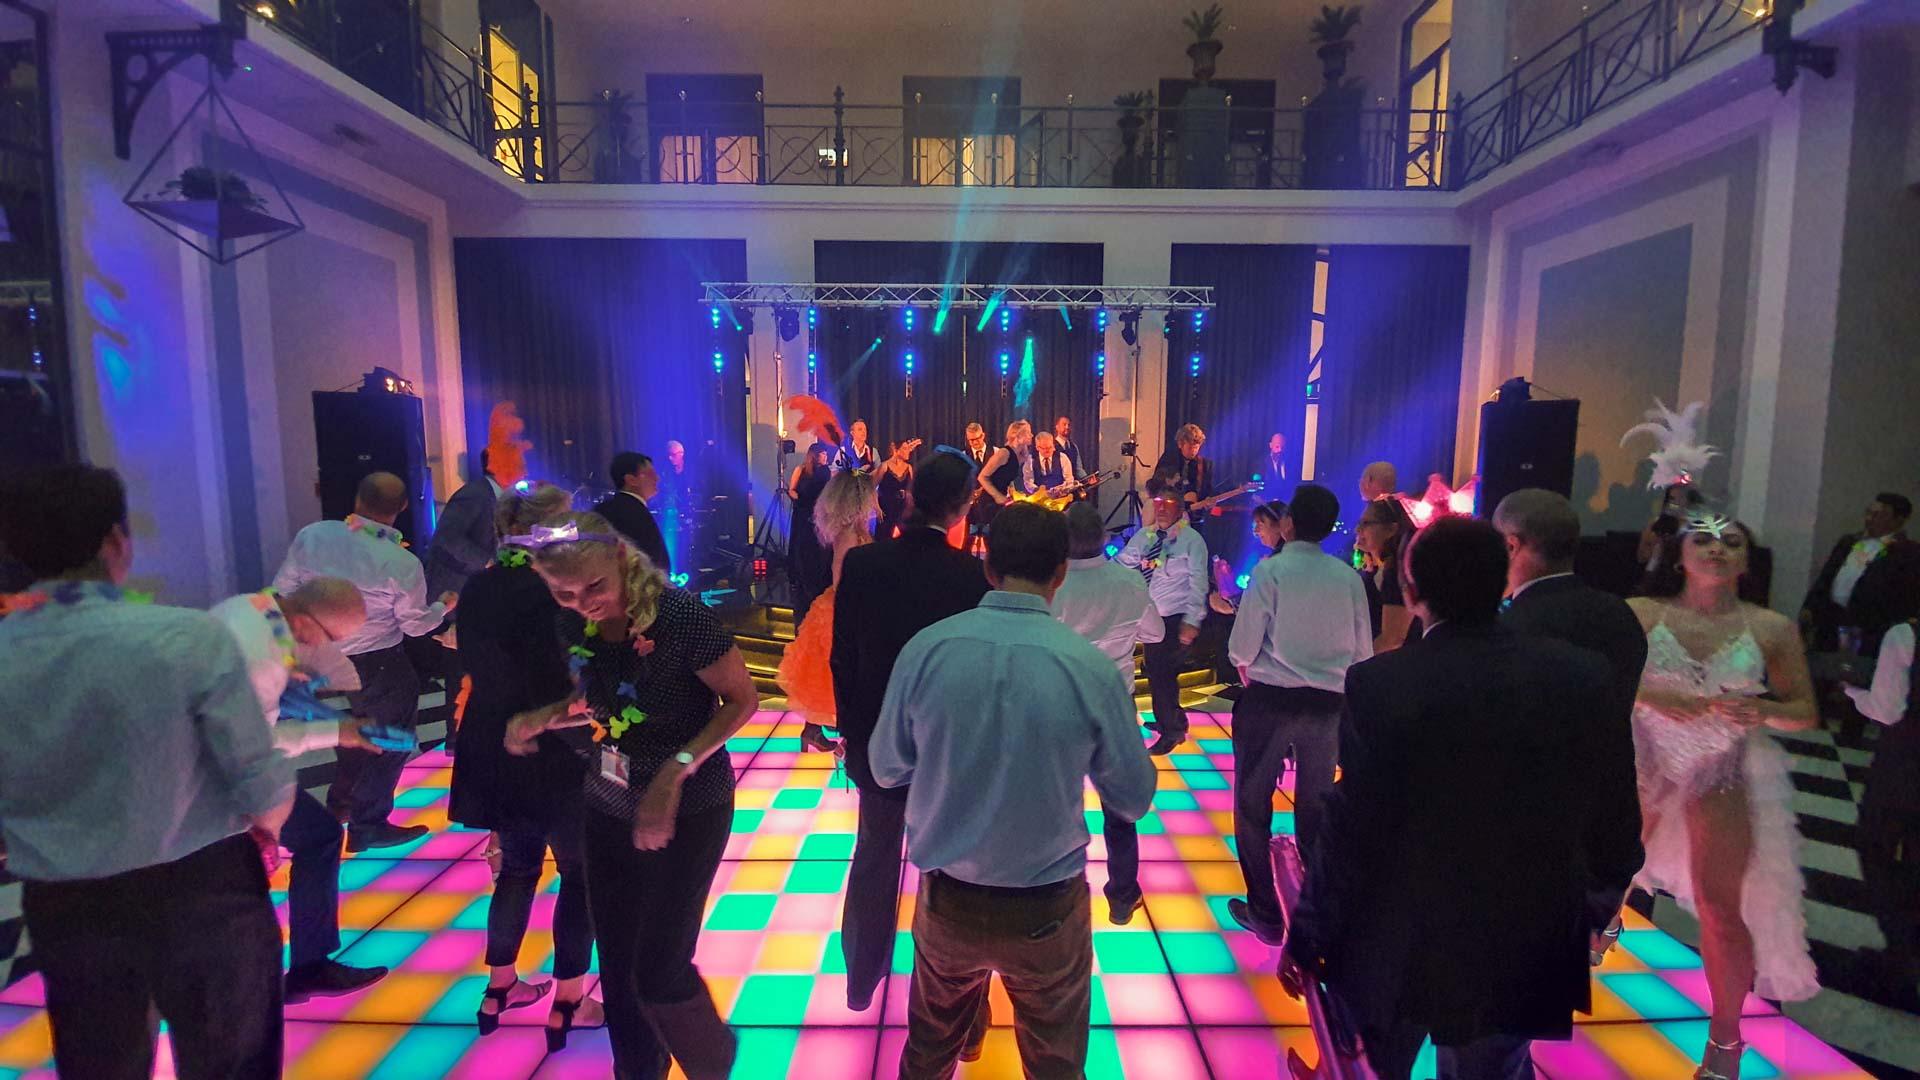 Audiovisuele techniek - Personeelsfeest in het Krasnapolsky hotel Amsterdam